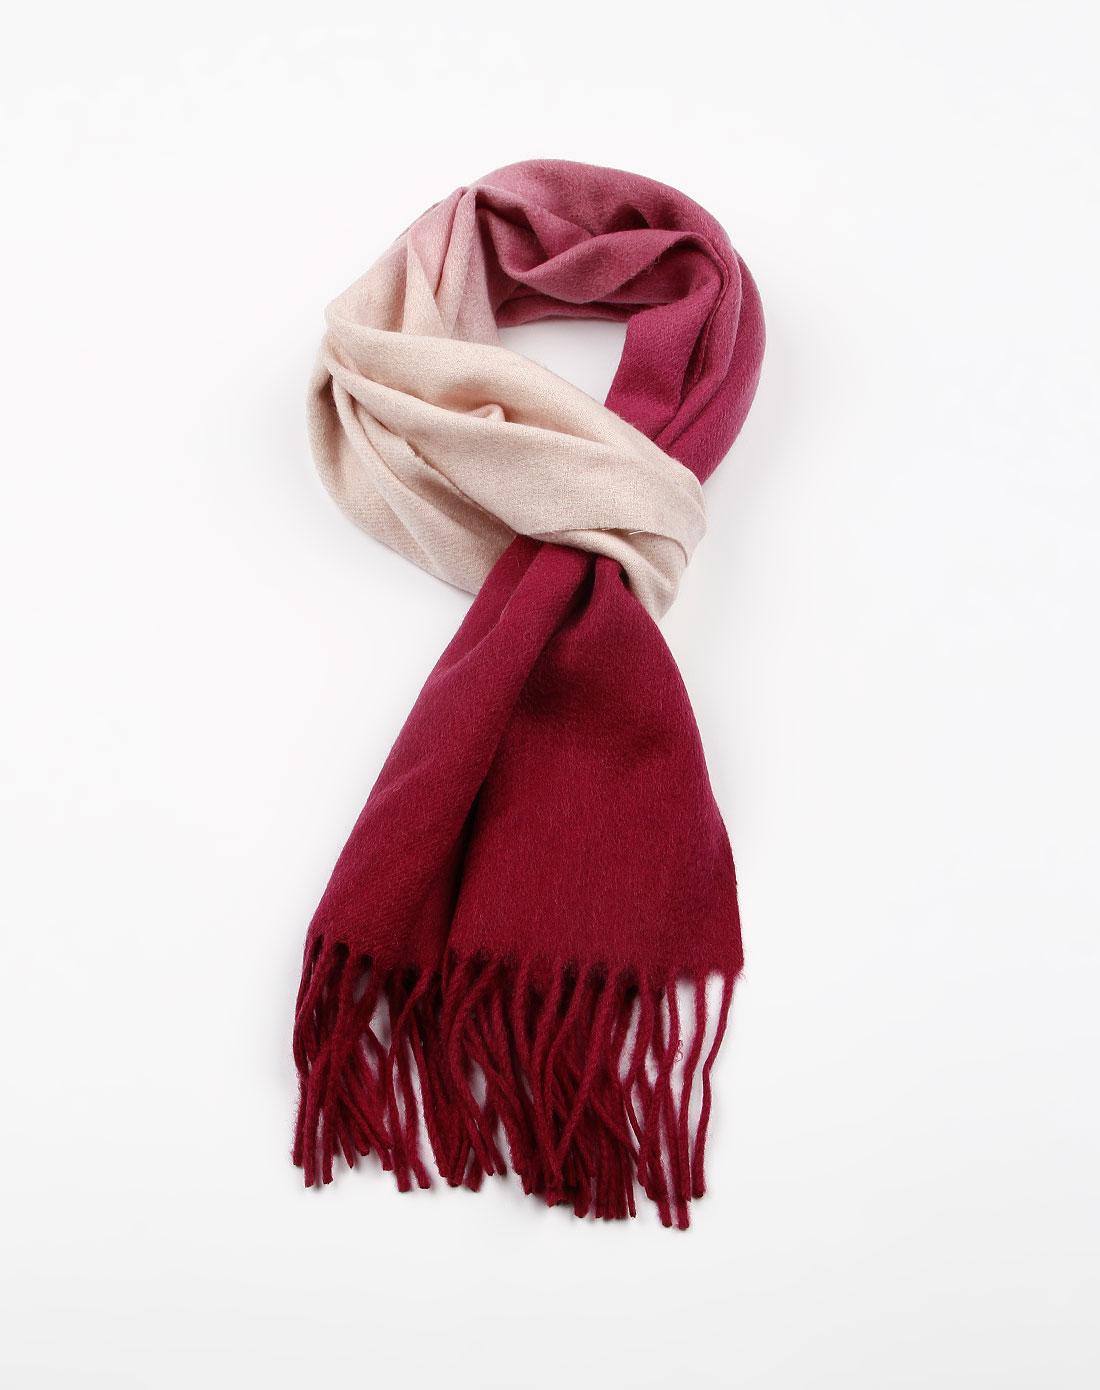 b&balos紫/白色渐变色羊绒围巾w2290215